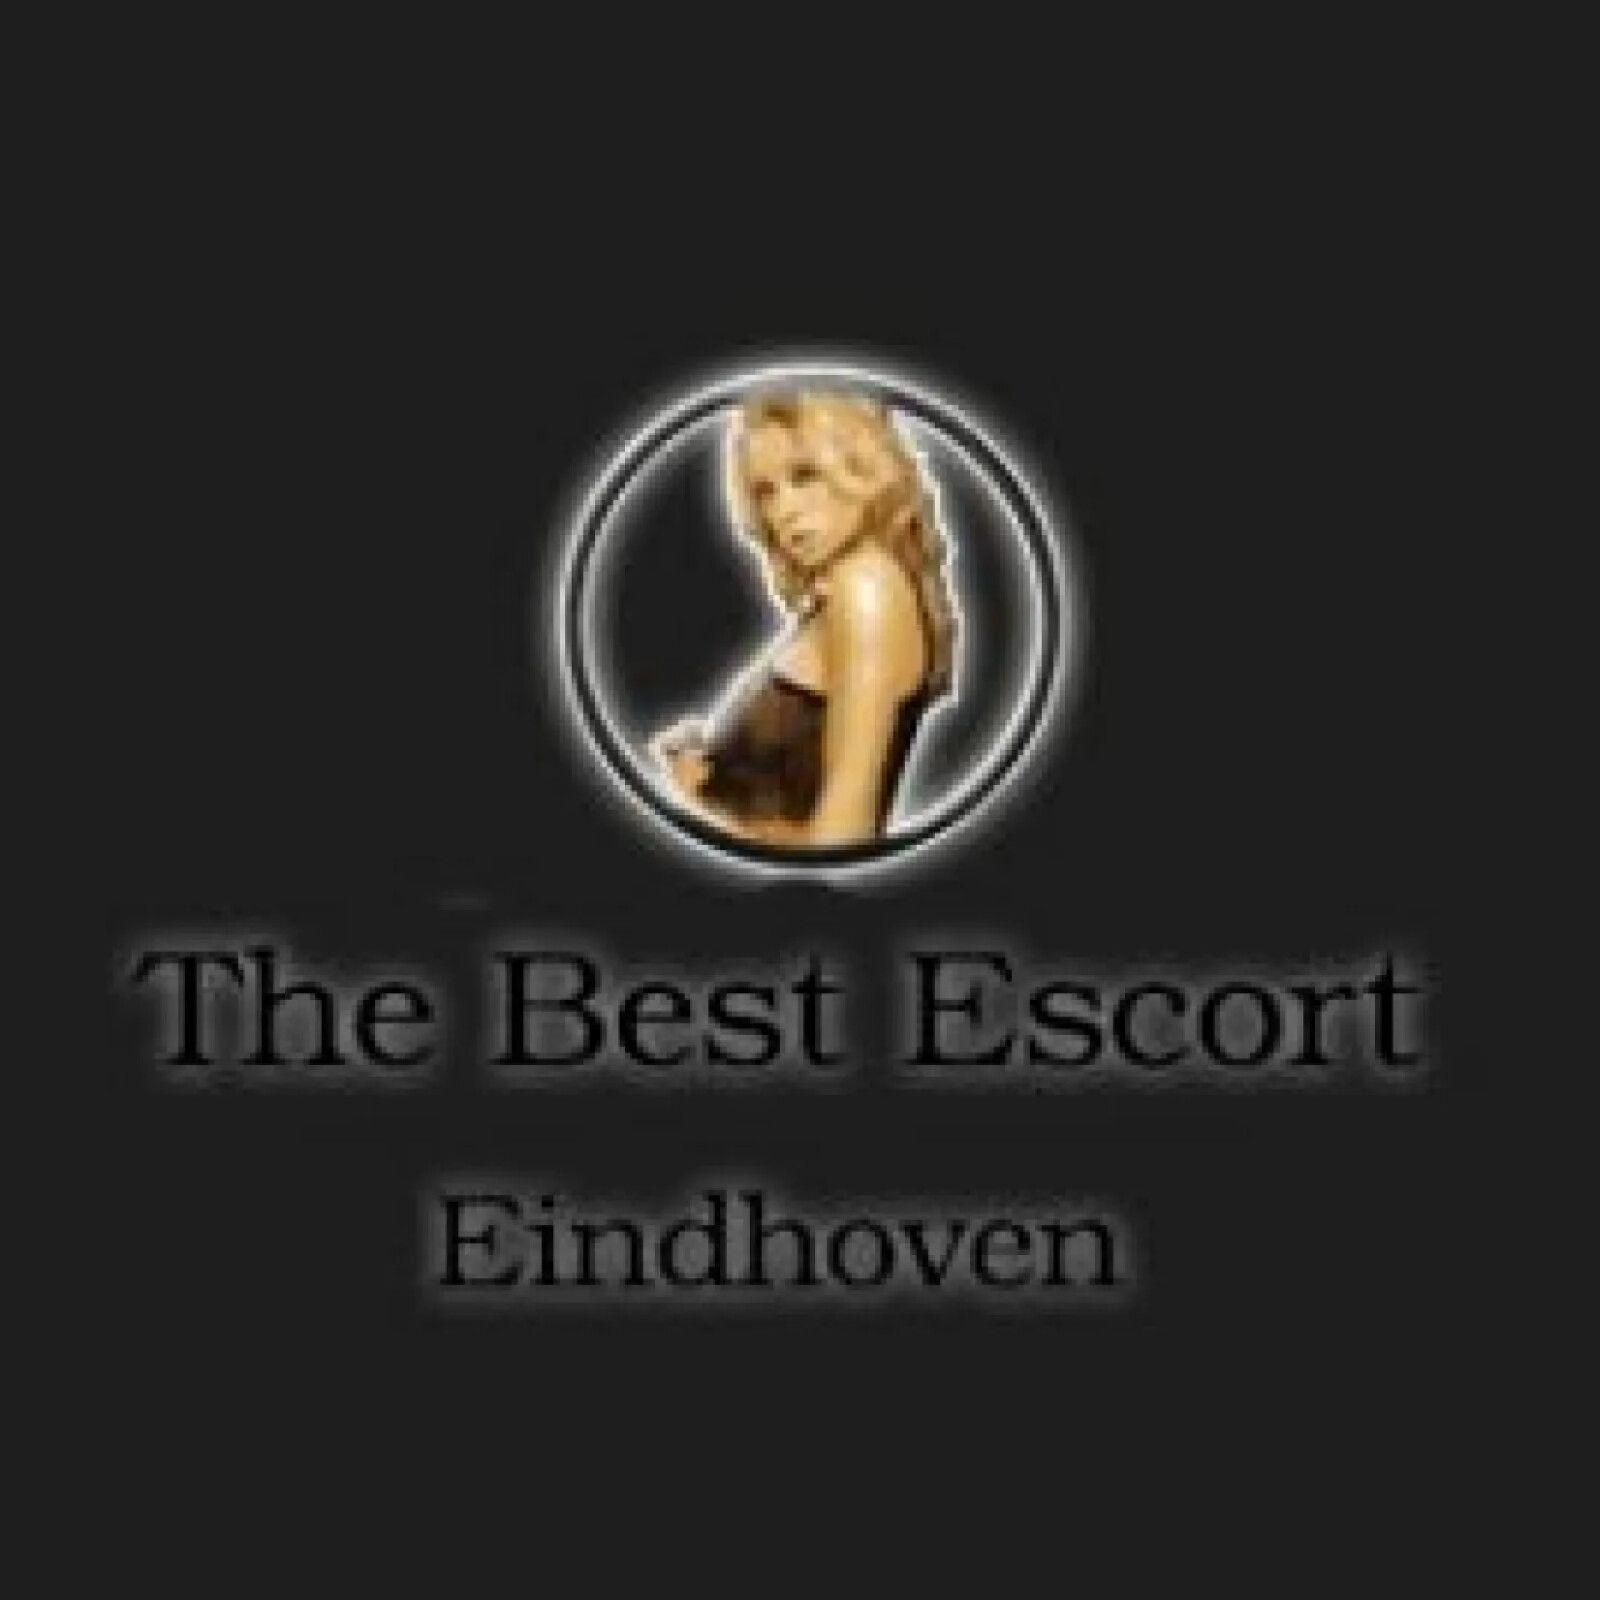 the-best-escort